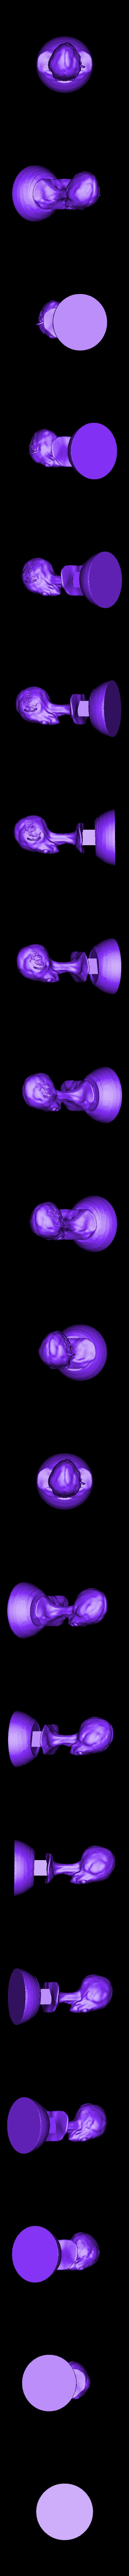 Alien_Bust.stl Download free STL file Misc. - Alien Bust (2016) • 3D print model, whackolantern